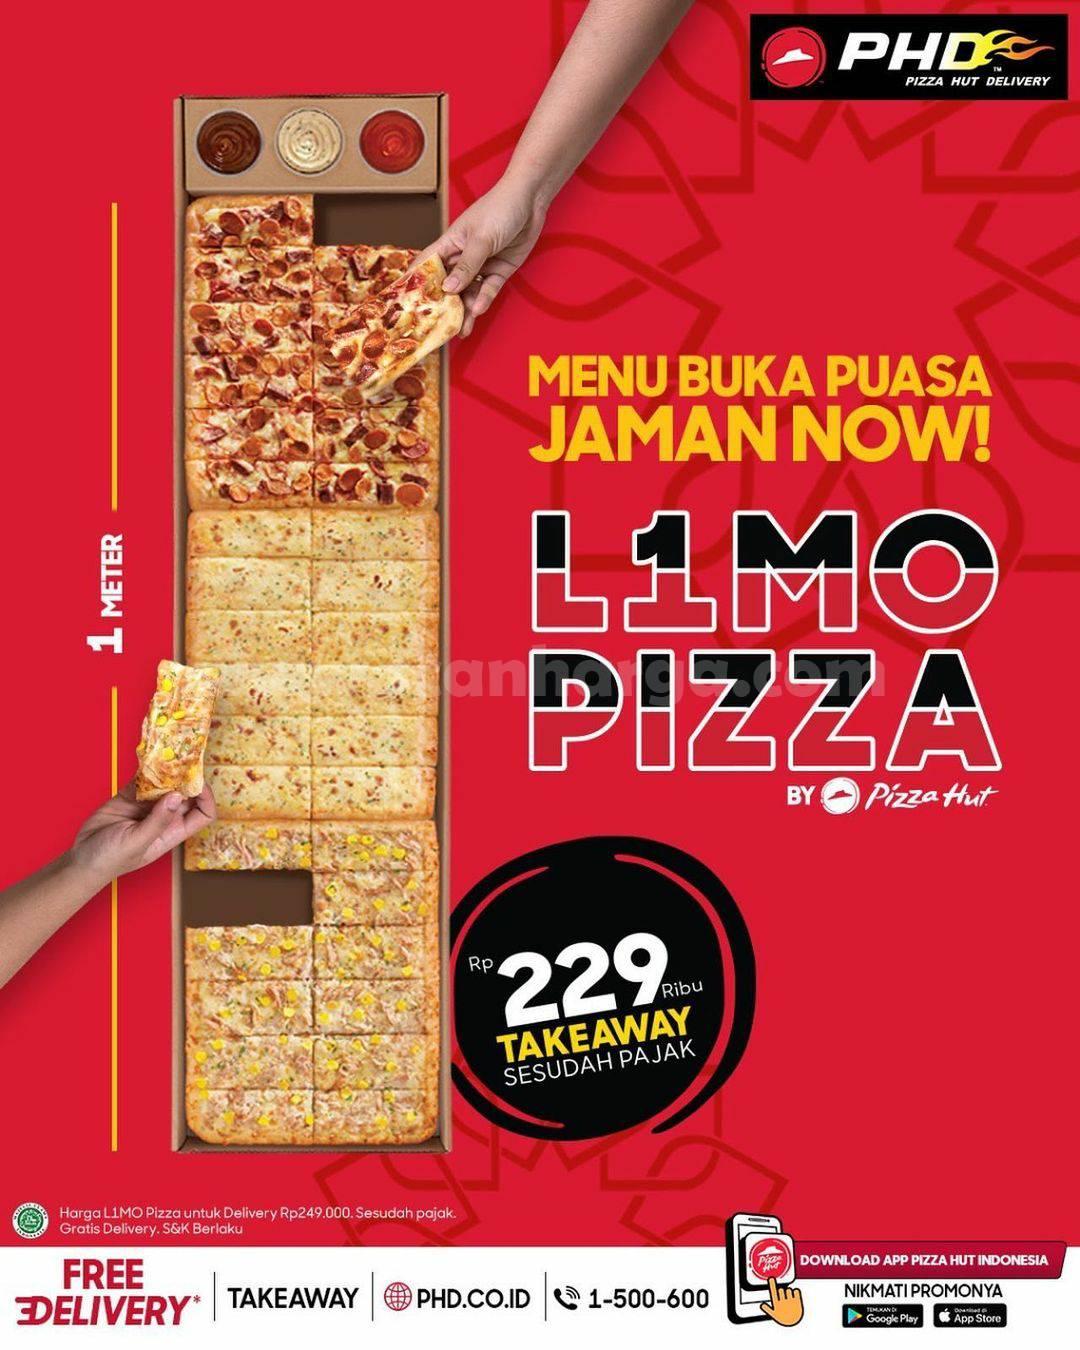 L1MO PIZZA PHD #1 Meter hanya Rp. 229Ribu + Free Delivery